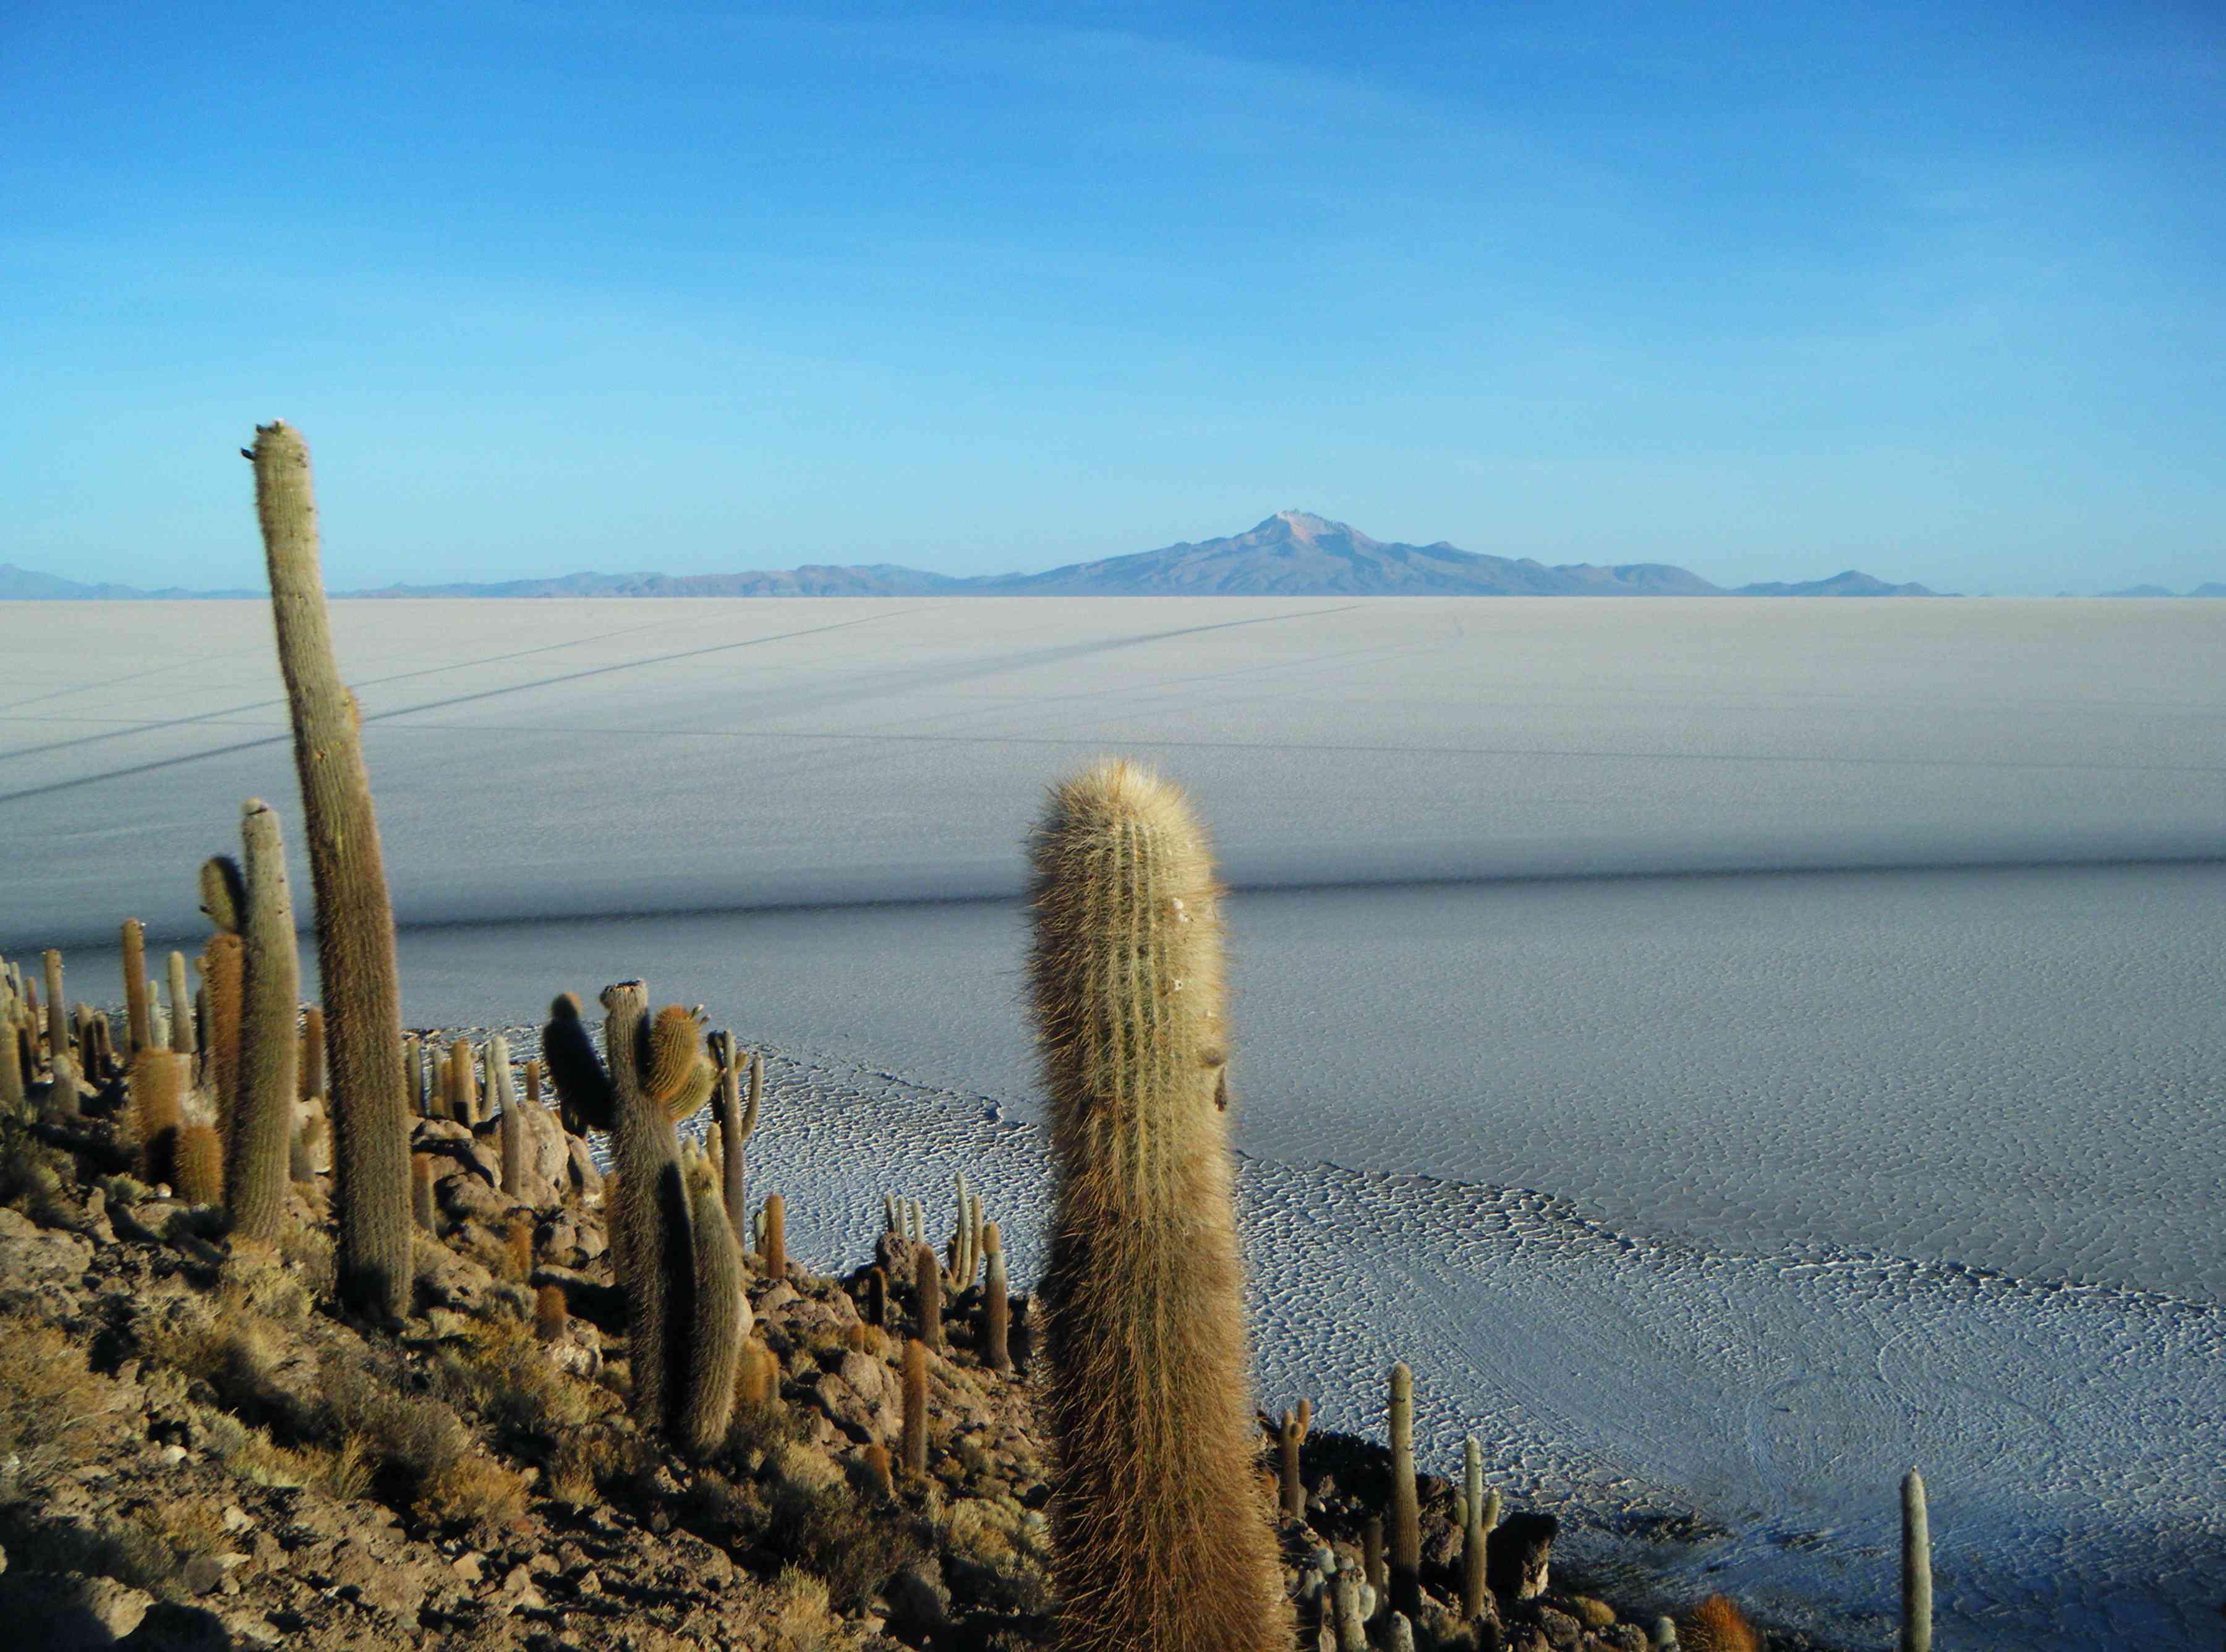 Cacti and rock along the edges of the Isla Del Pescado on the Salar De Uyuni